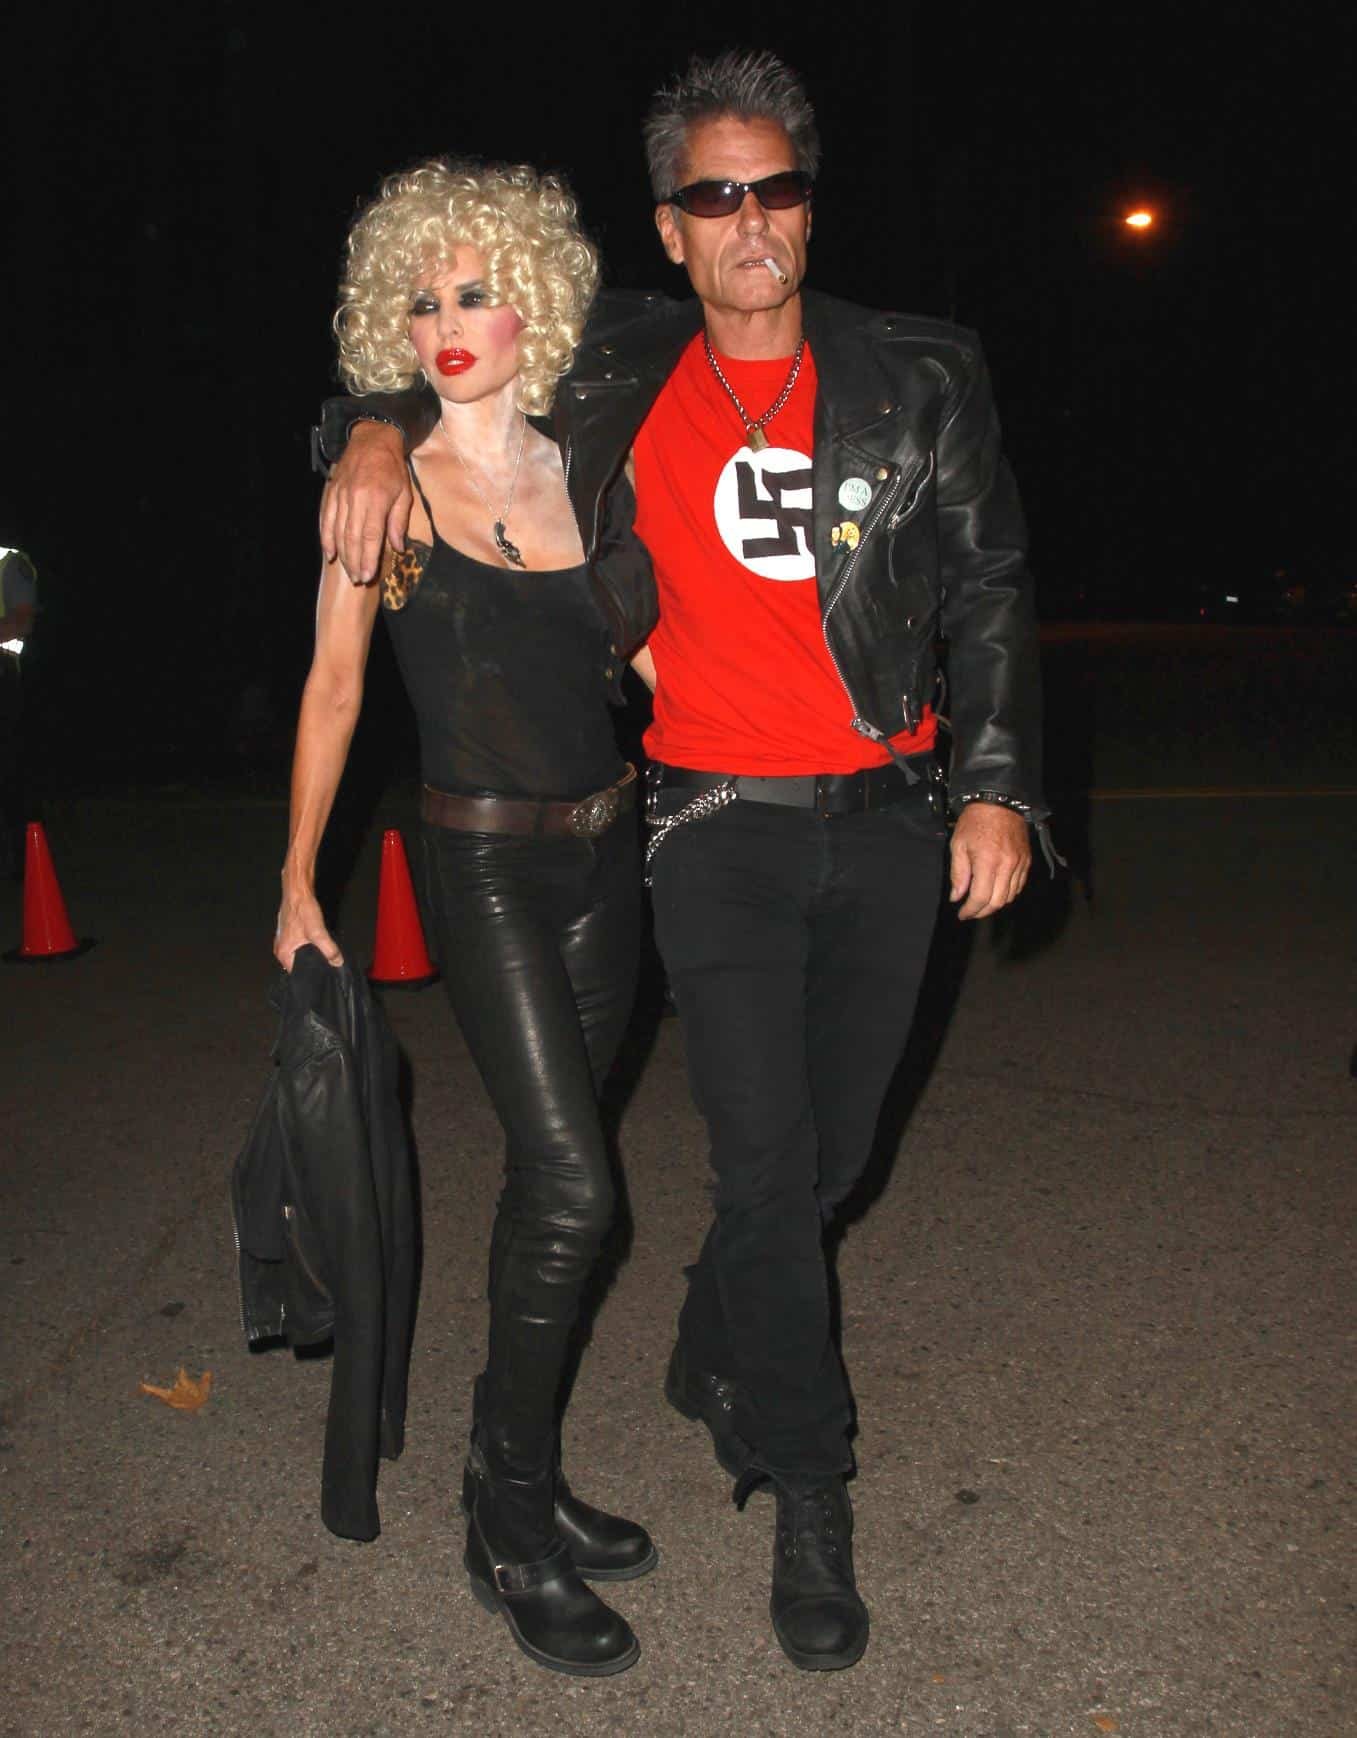 Harry Hamlin Halloween 2020 Andy Cohen Addresses Harry Hamlin's Offensive Swastika Costume